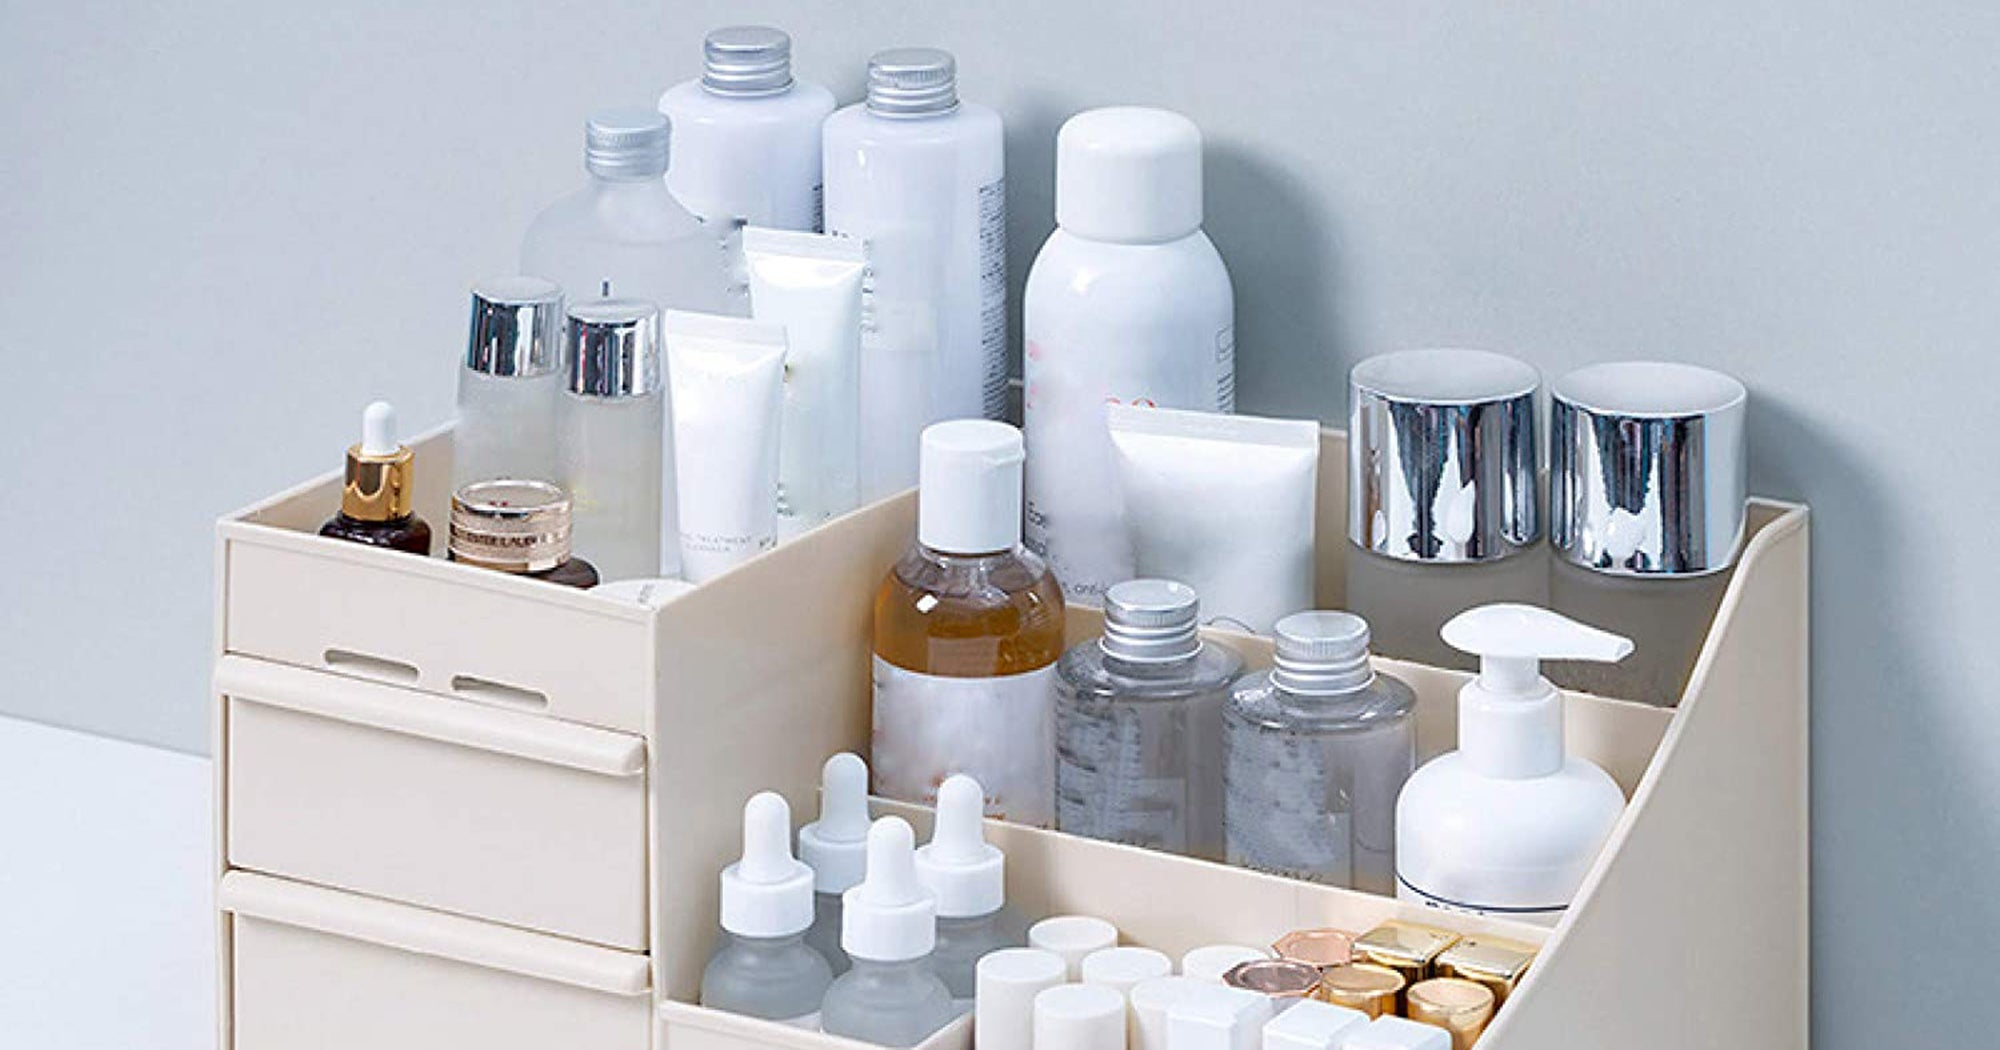 Bathroom Counter Organizers Stylish, Counter Bathroom Organizer Set